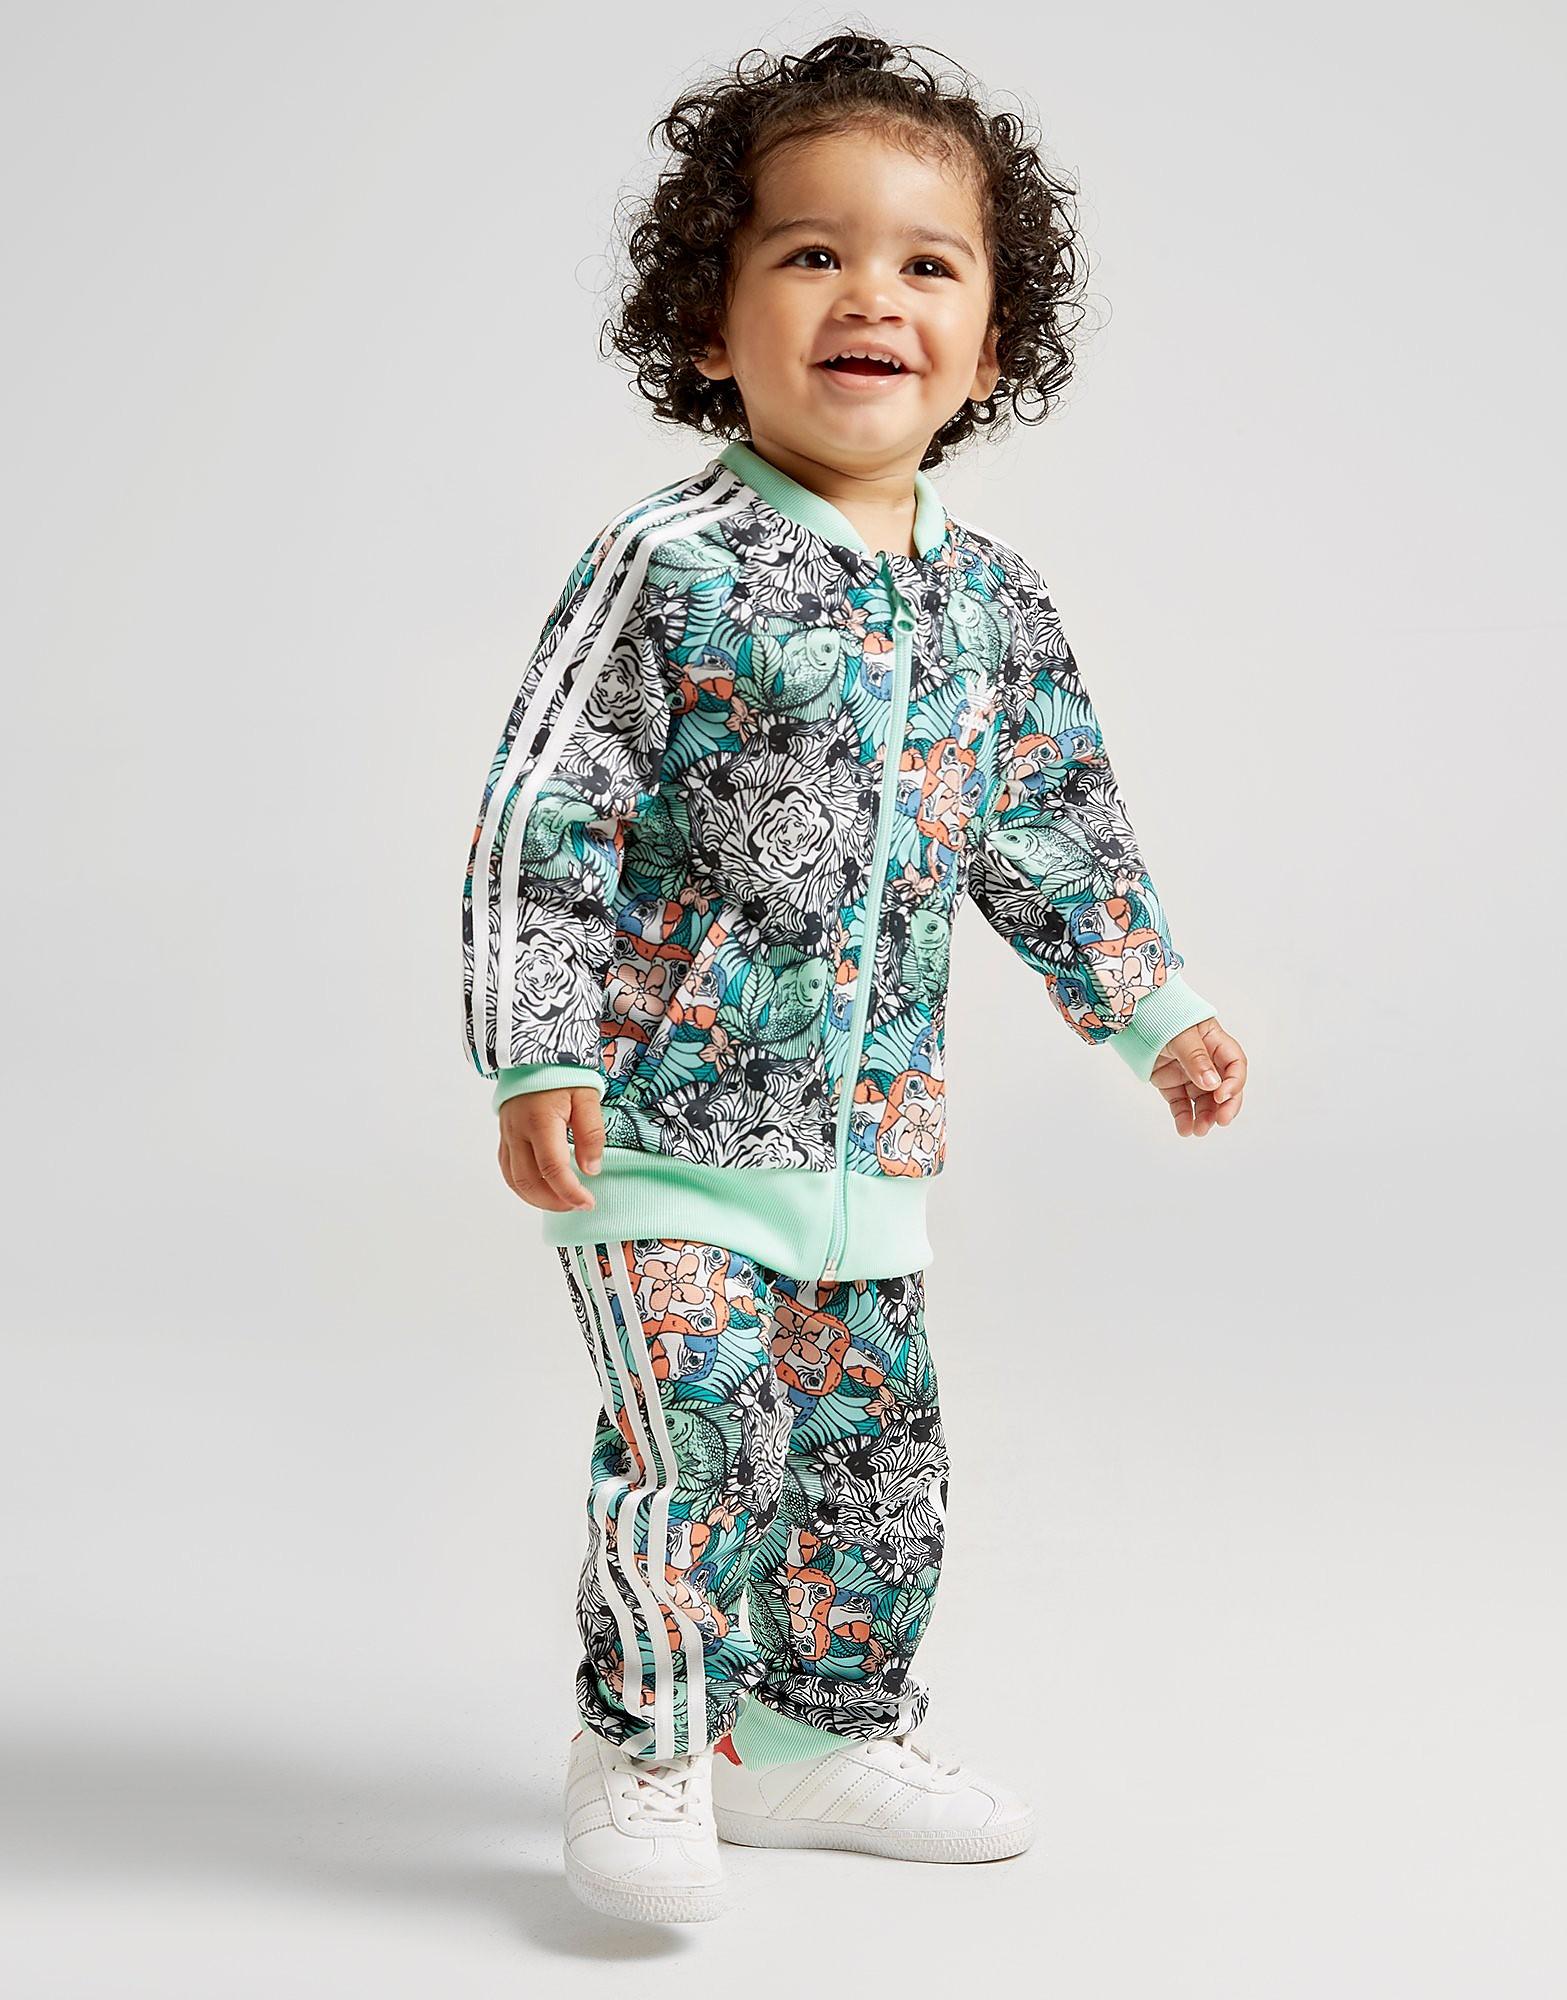 Adidas Originals Infants Clothing 0 3 Years Kids Jd Sports